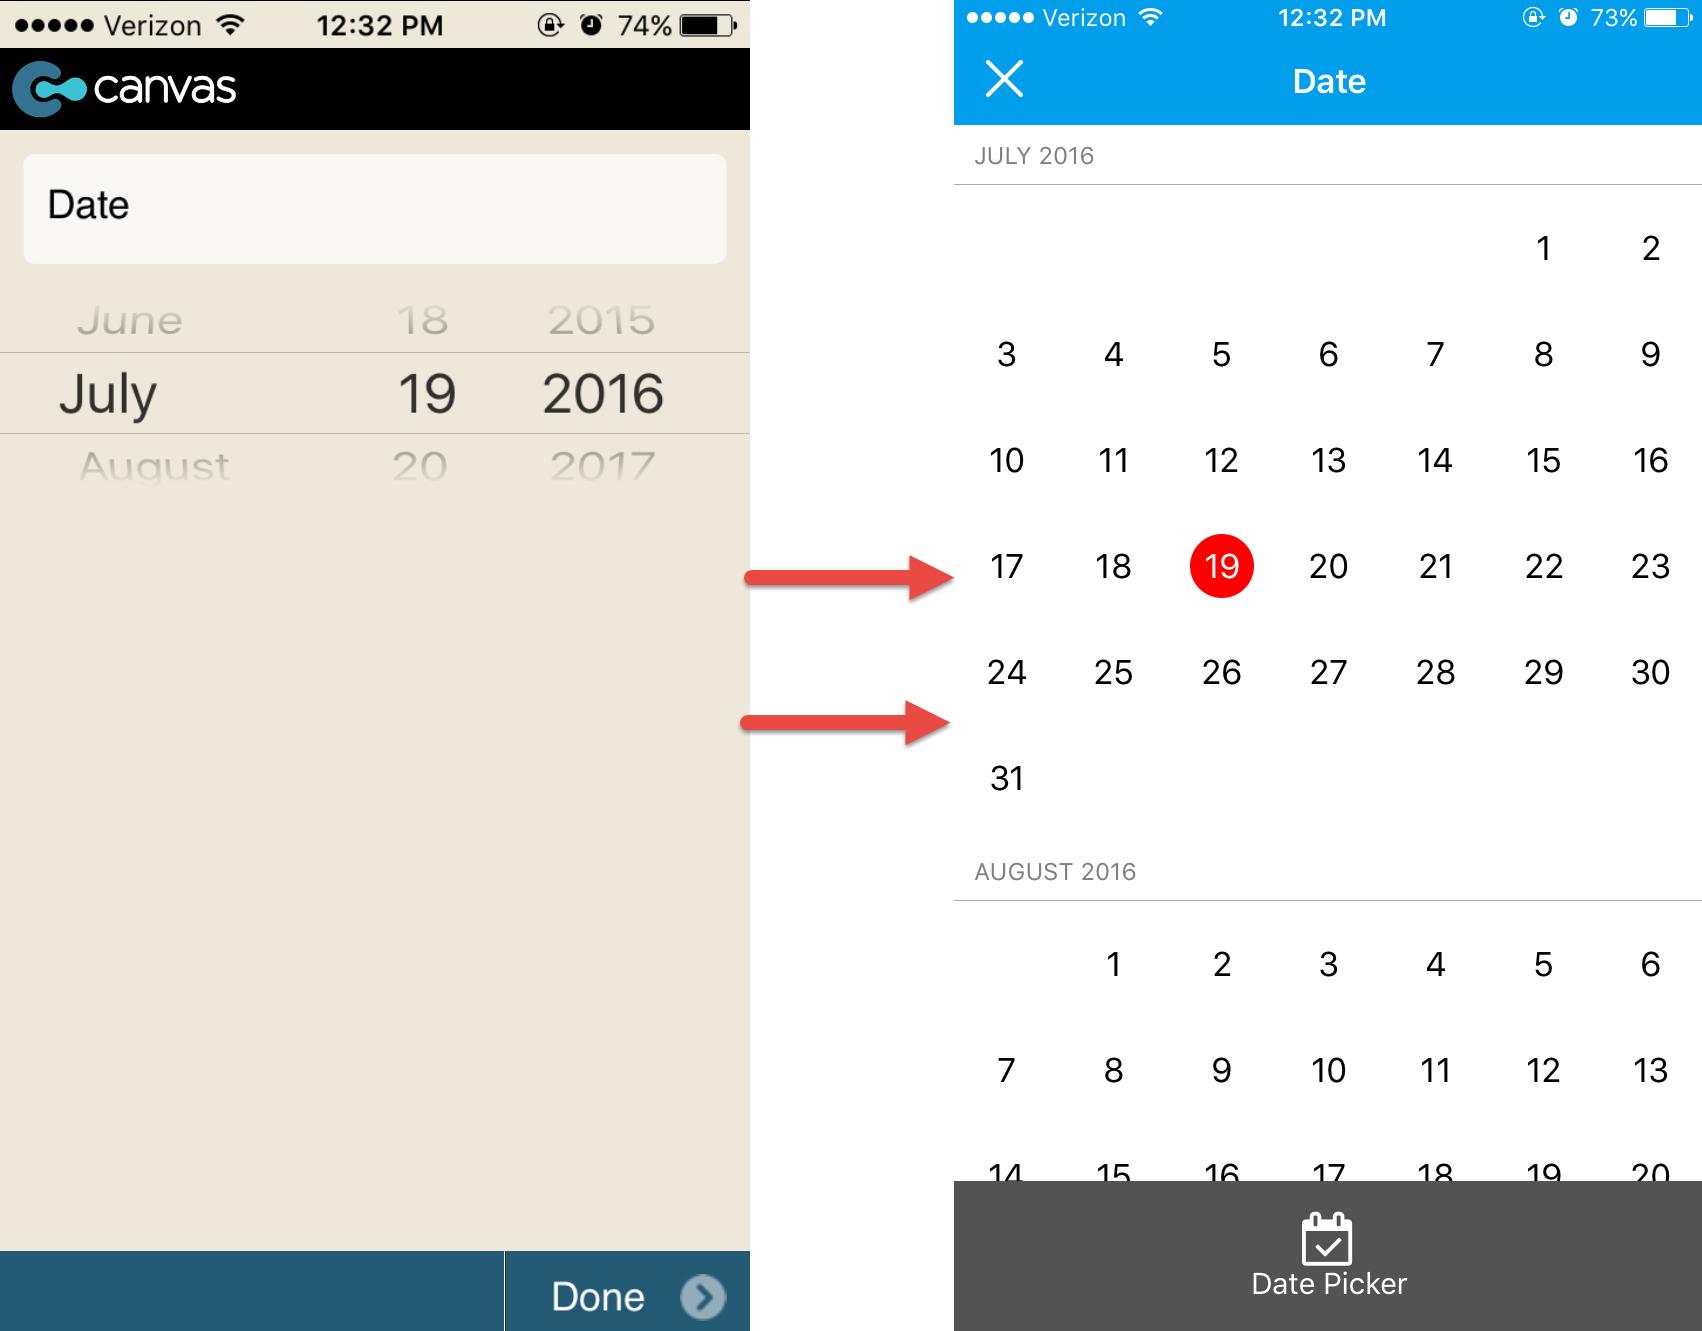 Check out the new GoCanvas calendar view